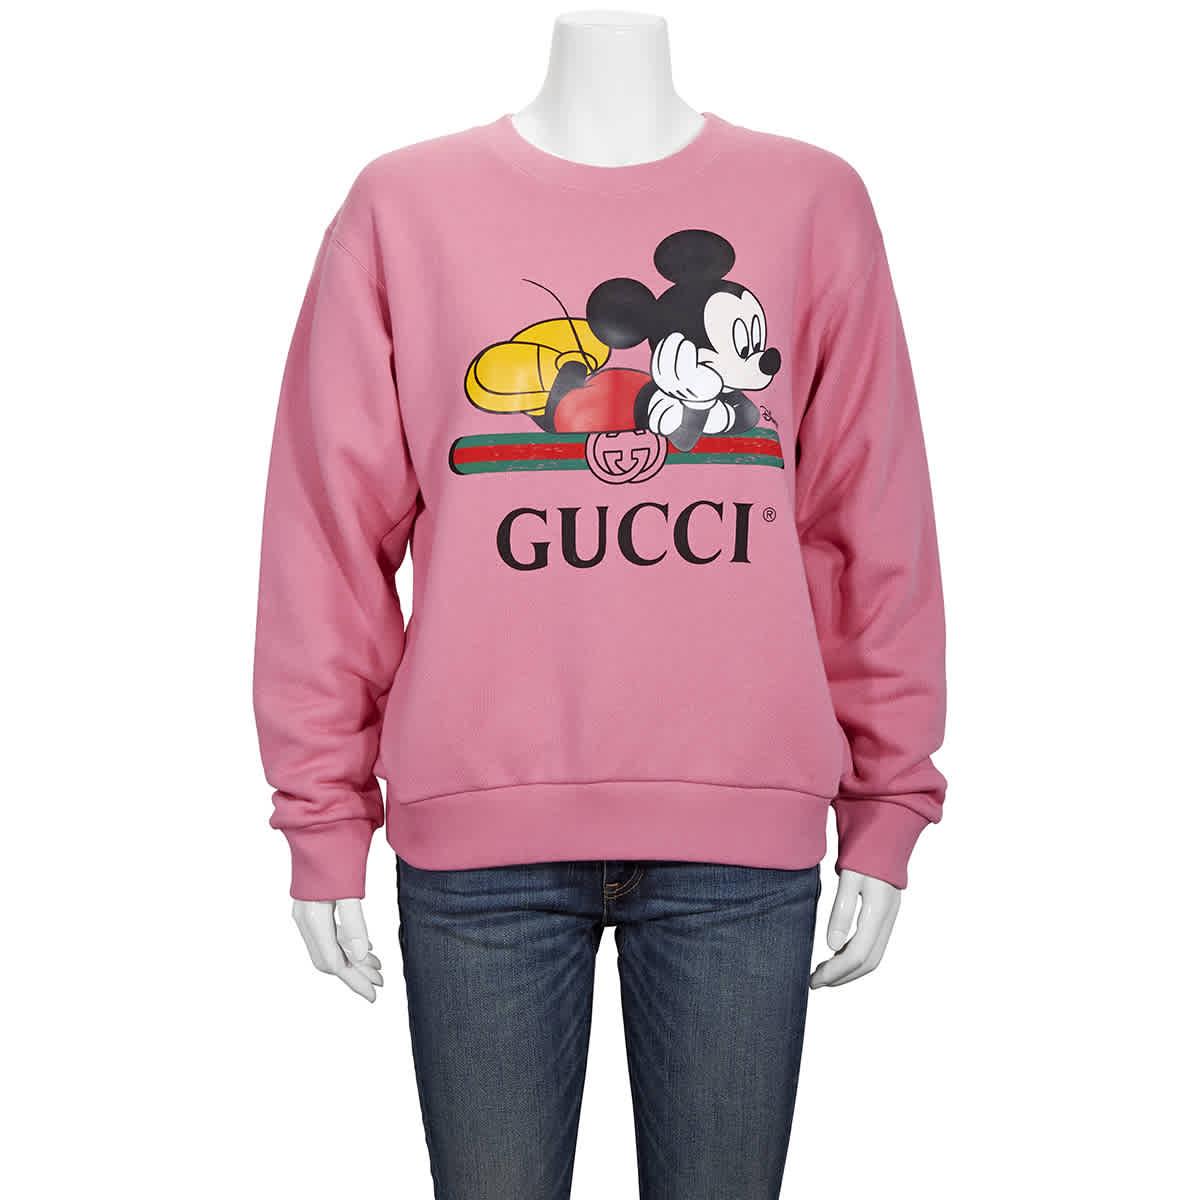 Gucci X Disney Mickey Print Sweatshirt In Pink